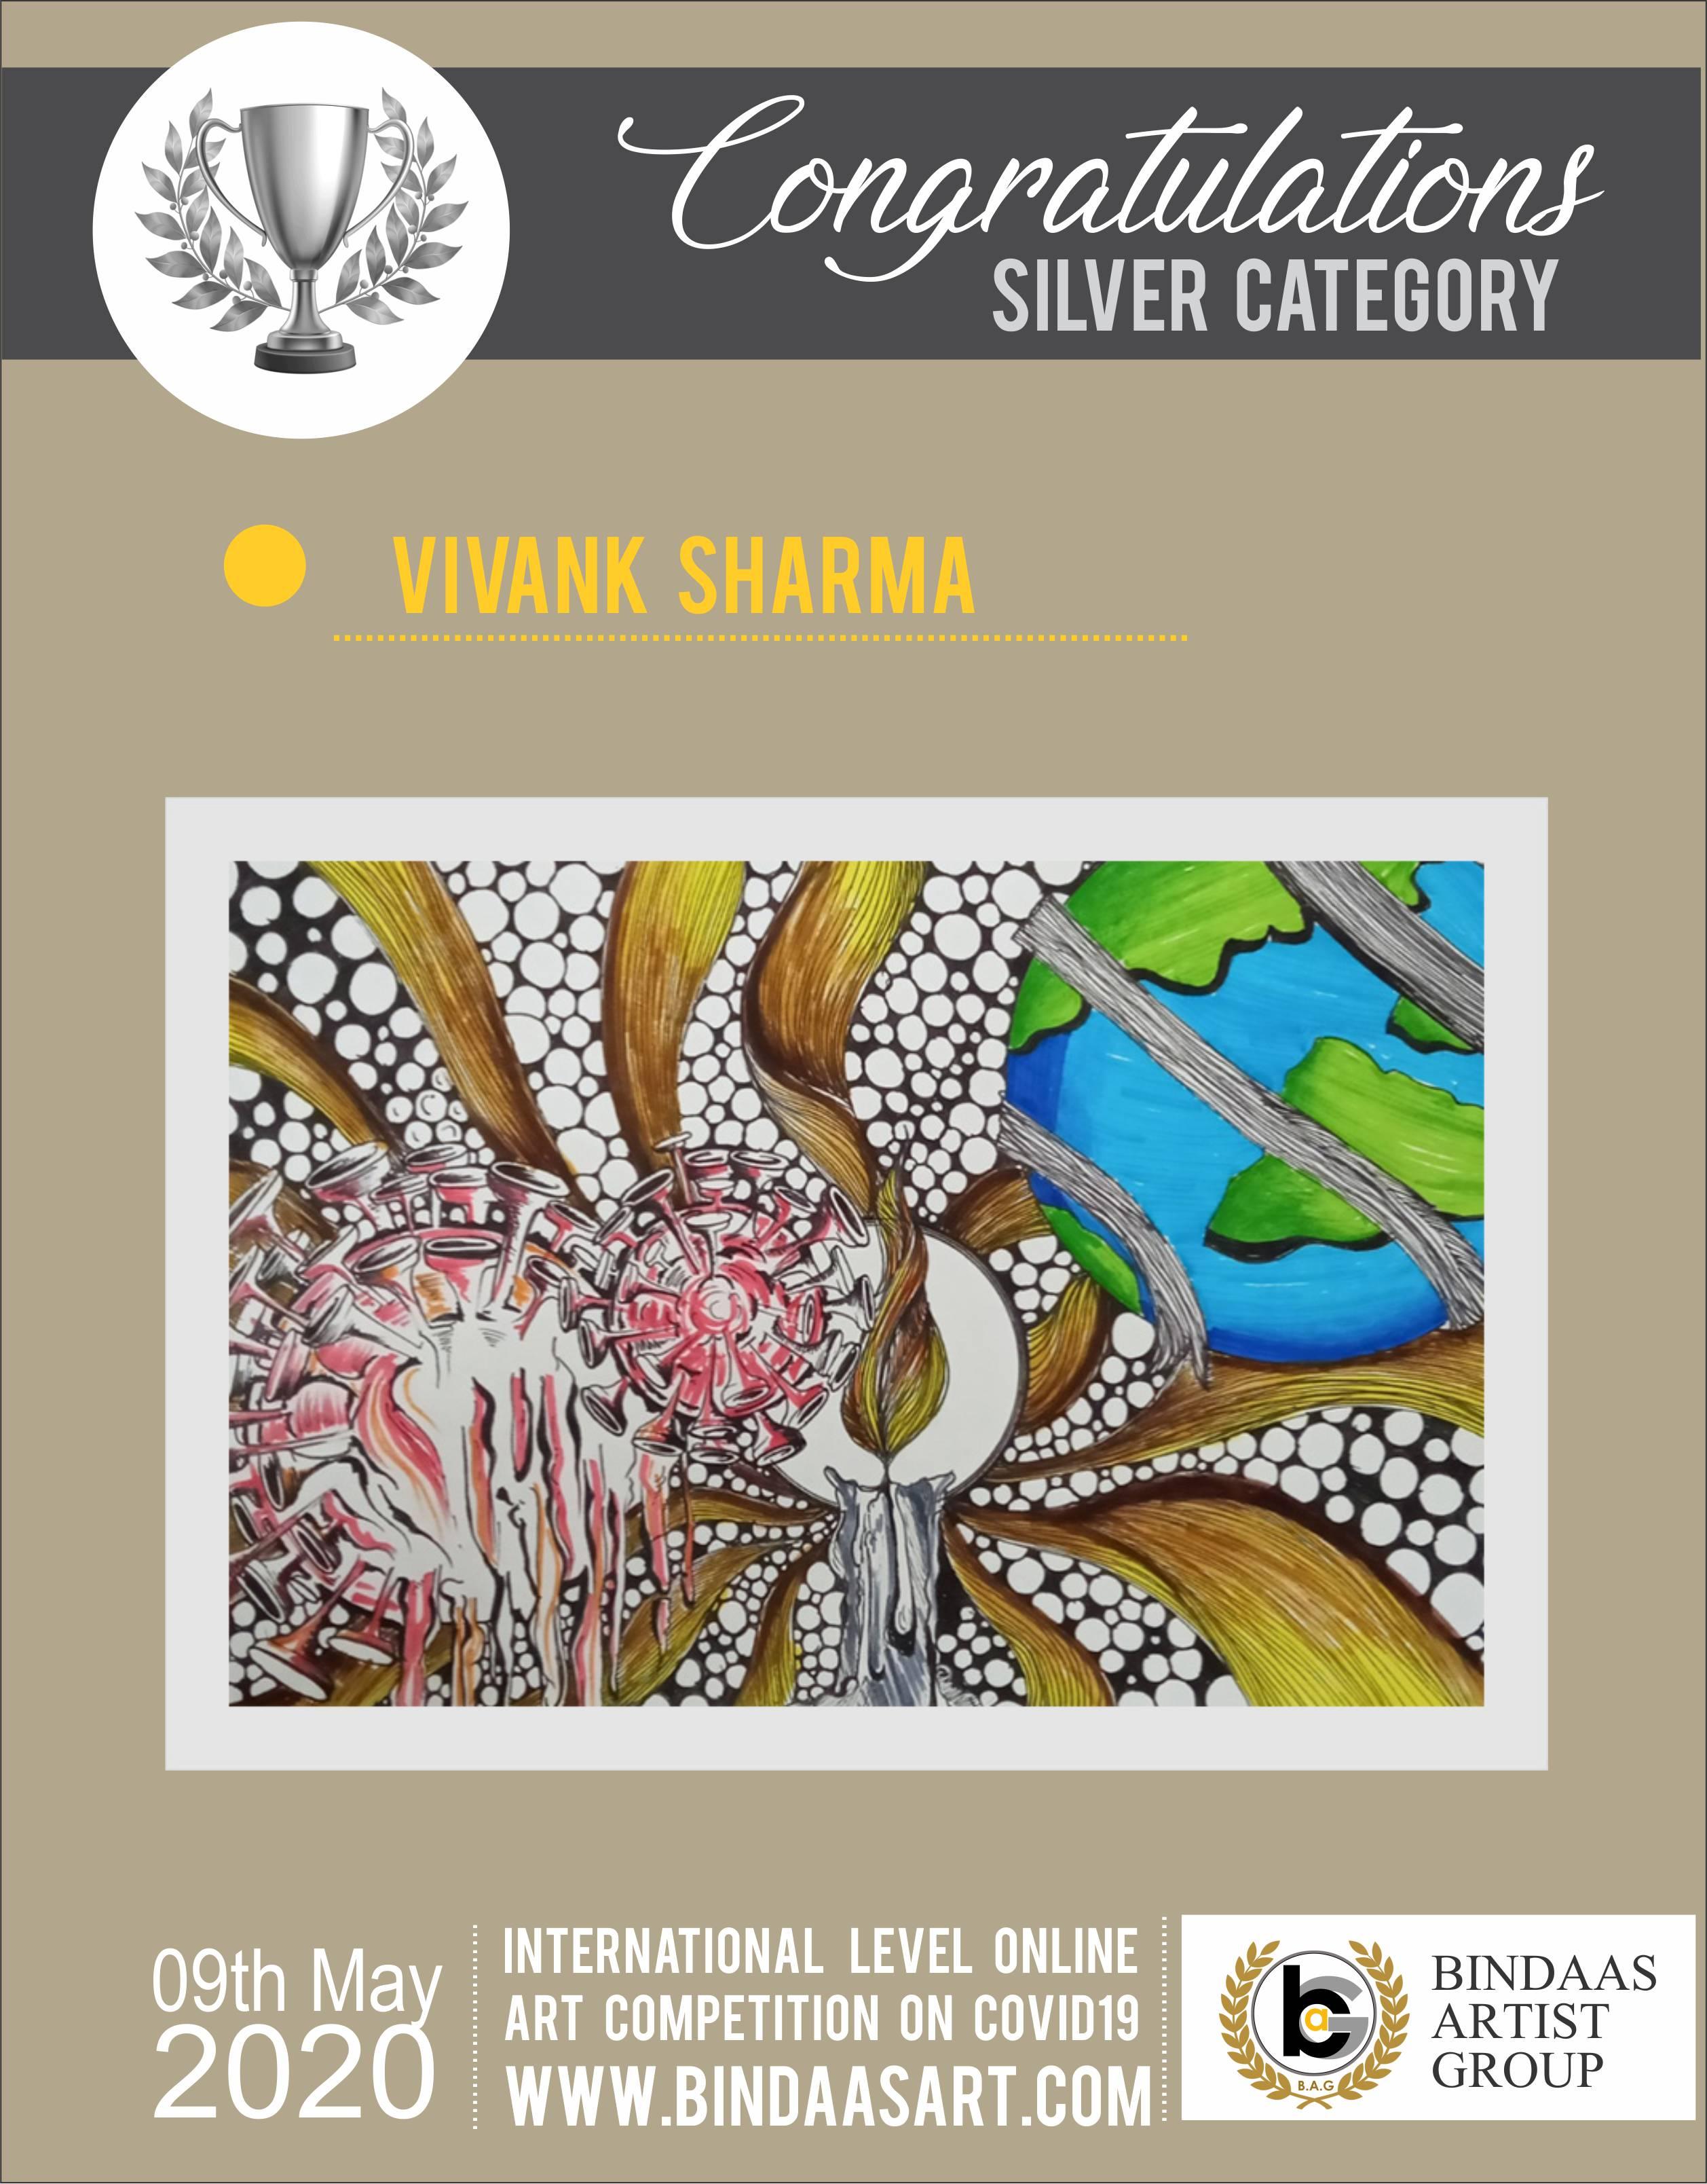 vivank sharma